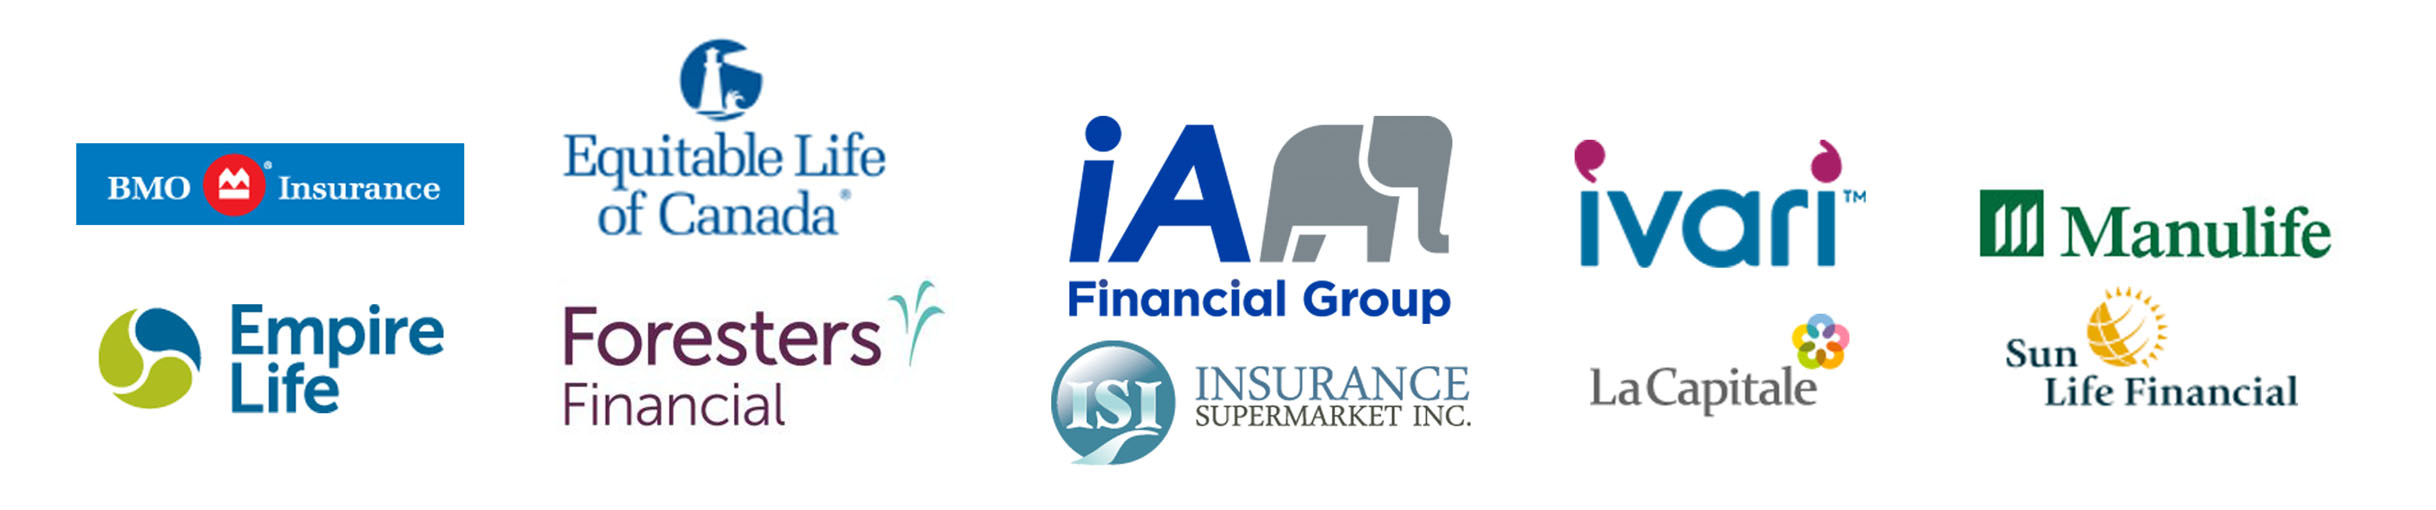 the financial doctor margaret janecki margaret janecki mortgage agent license m17000015 brokerage core capital partners inc operating as core advisory